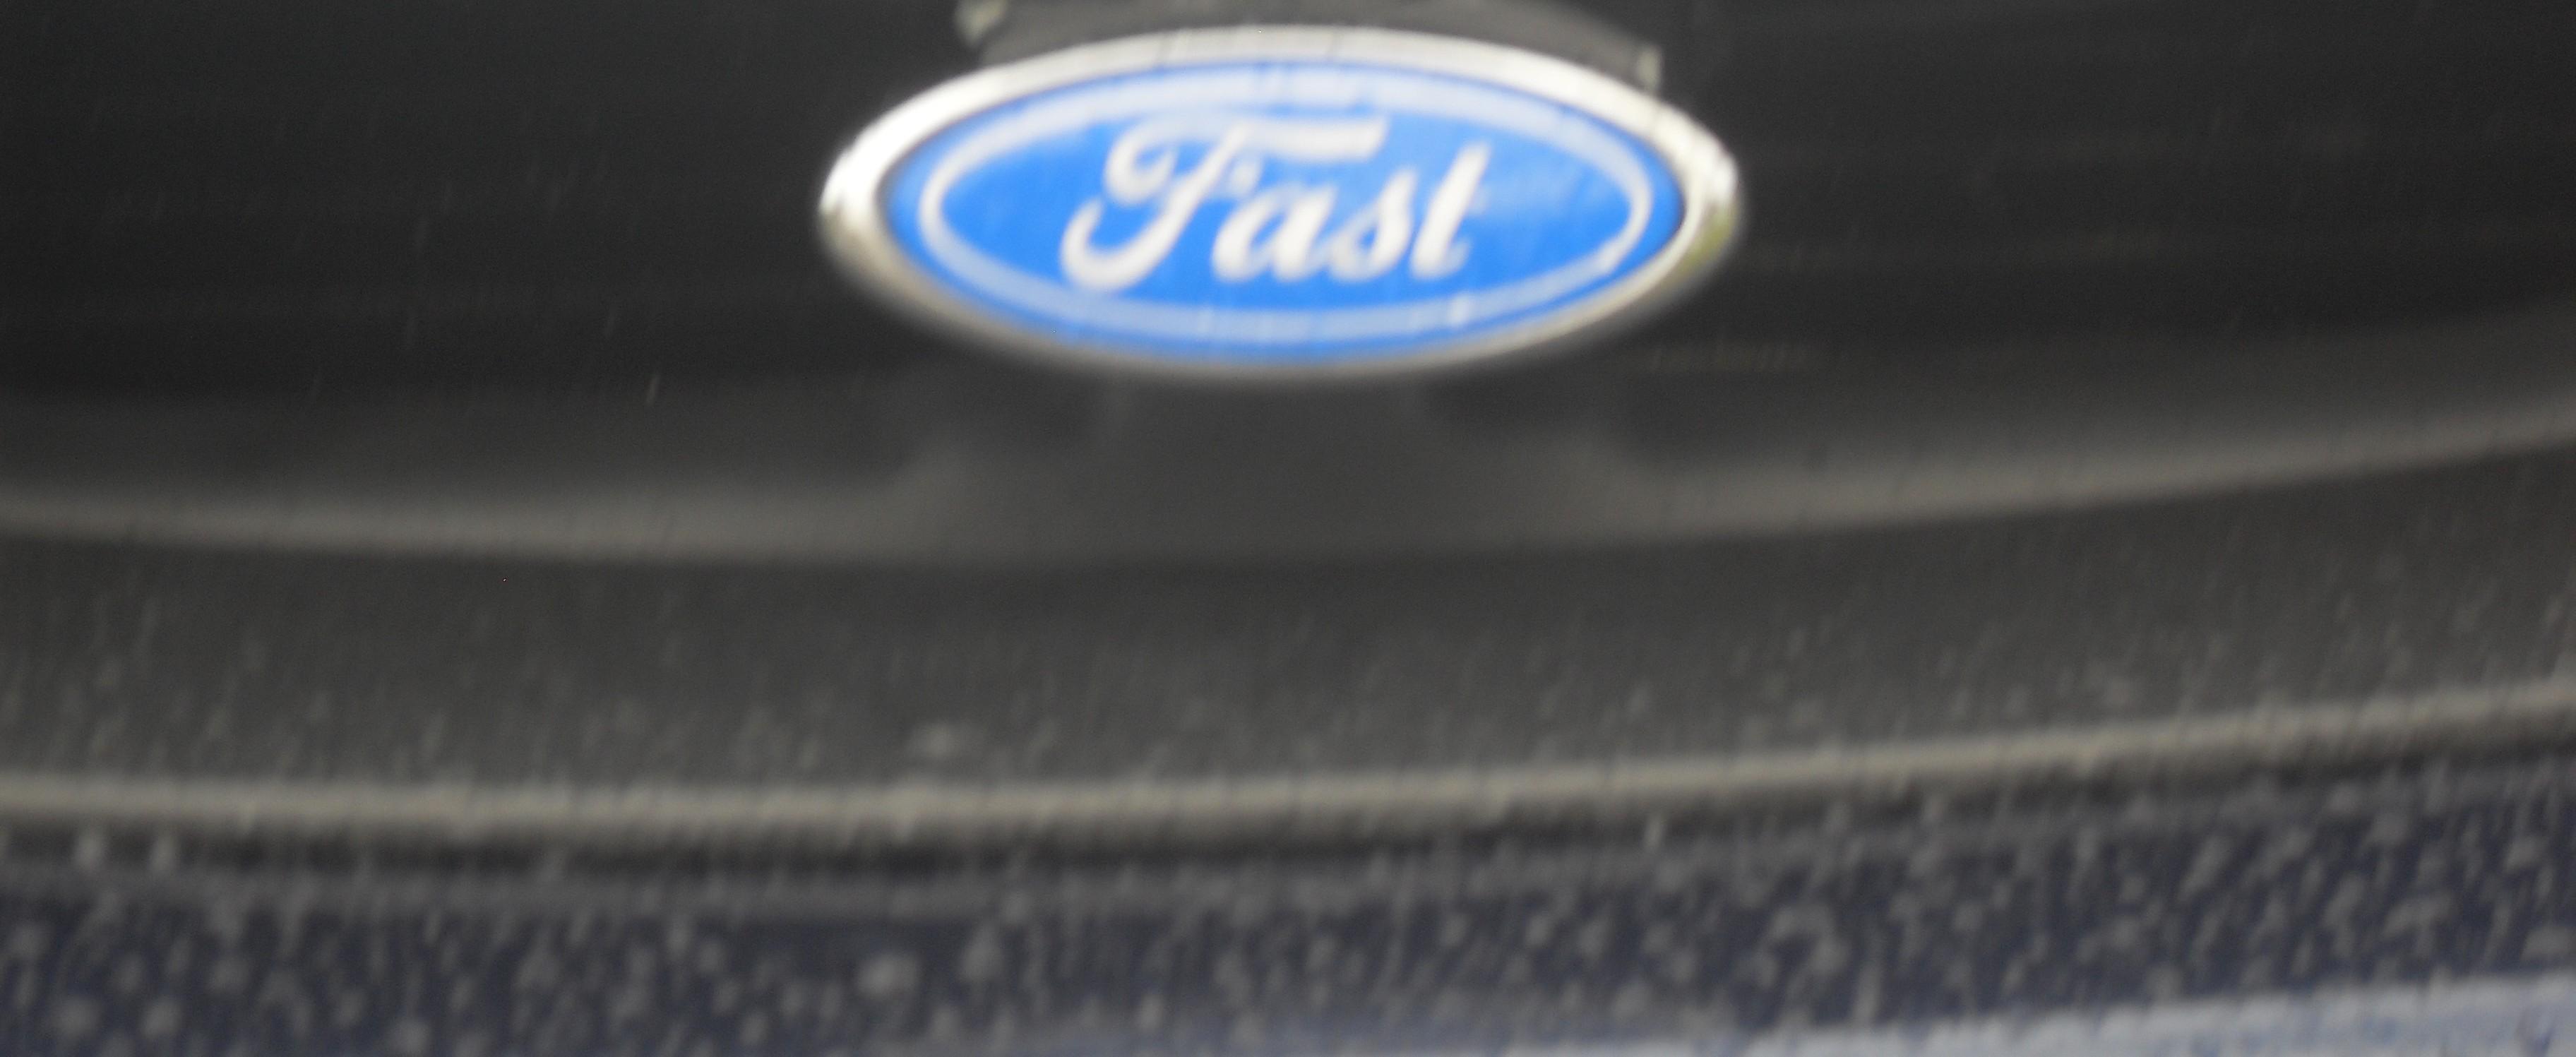 Click image for larger version  Name:FAST Emblem #1 001.JPG Views:86 Size:725.2 KB ID:105465